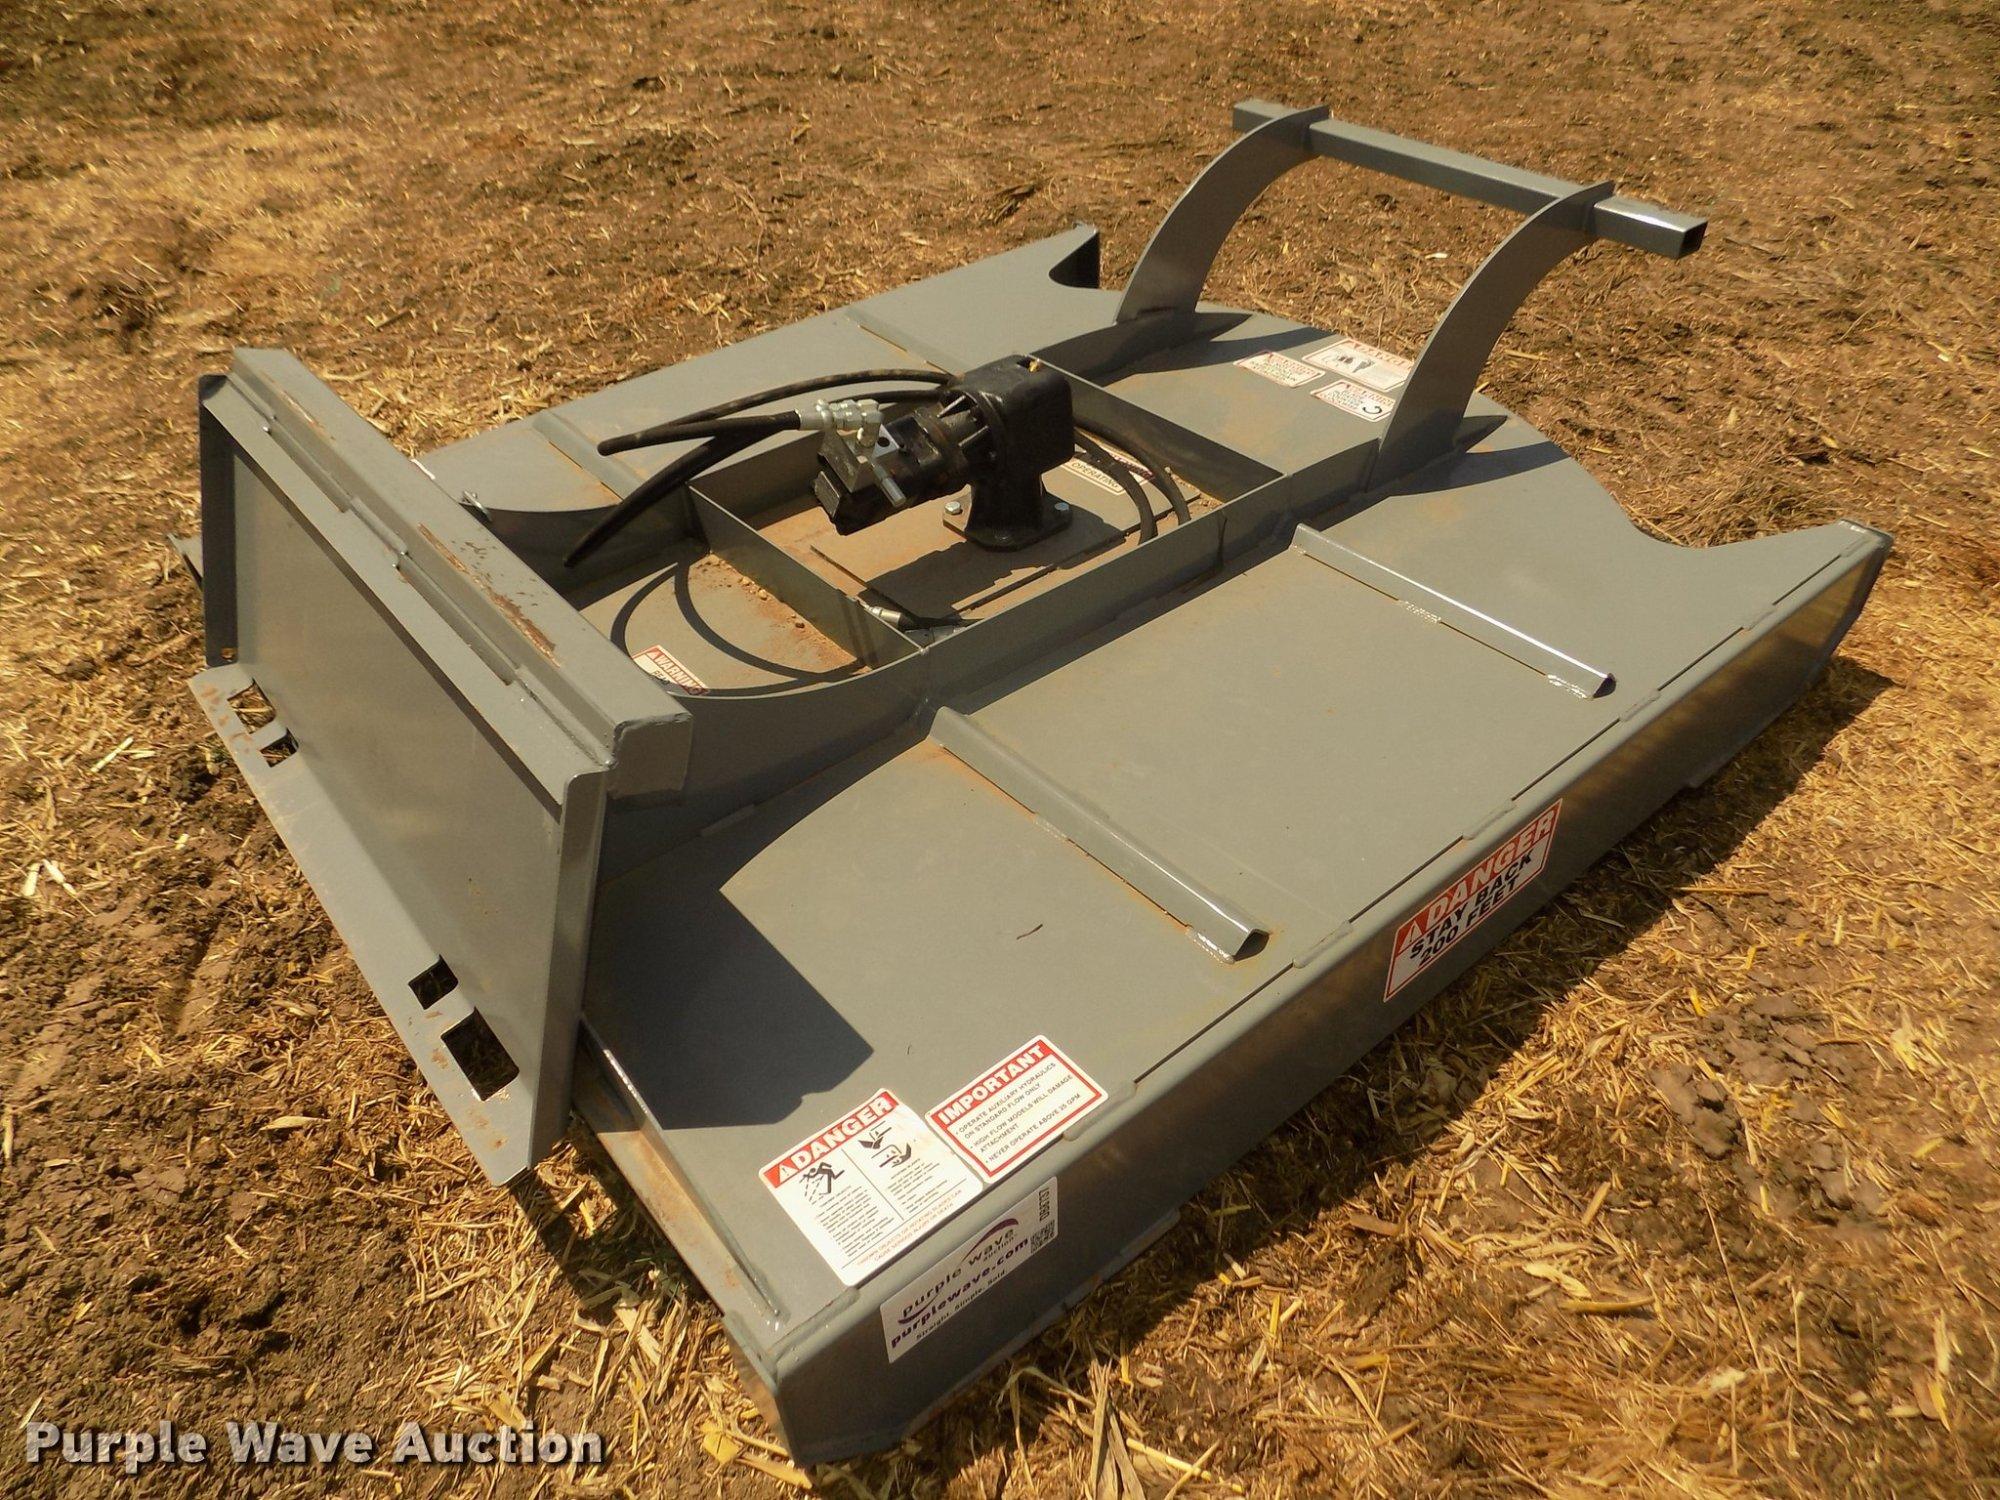 hight resolution of db8737 image for item db8737 2018 hawz skid steer brush cutter